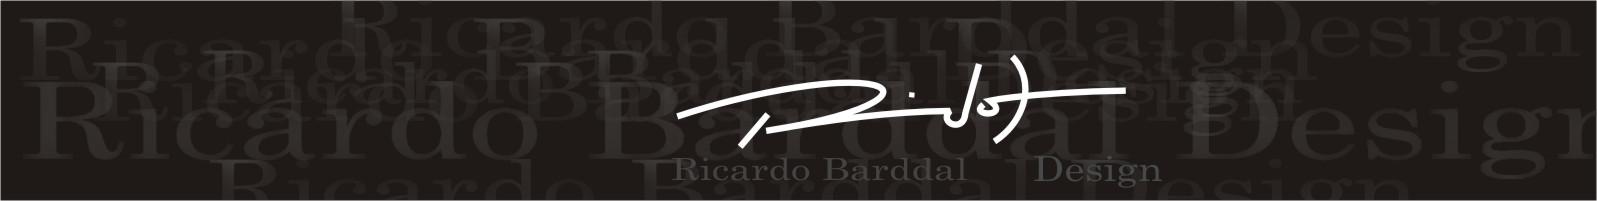 Ricardo Barddal Design